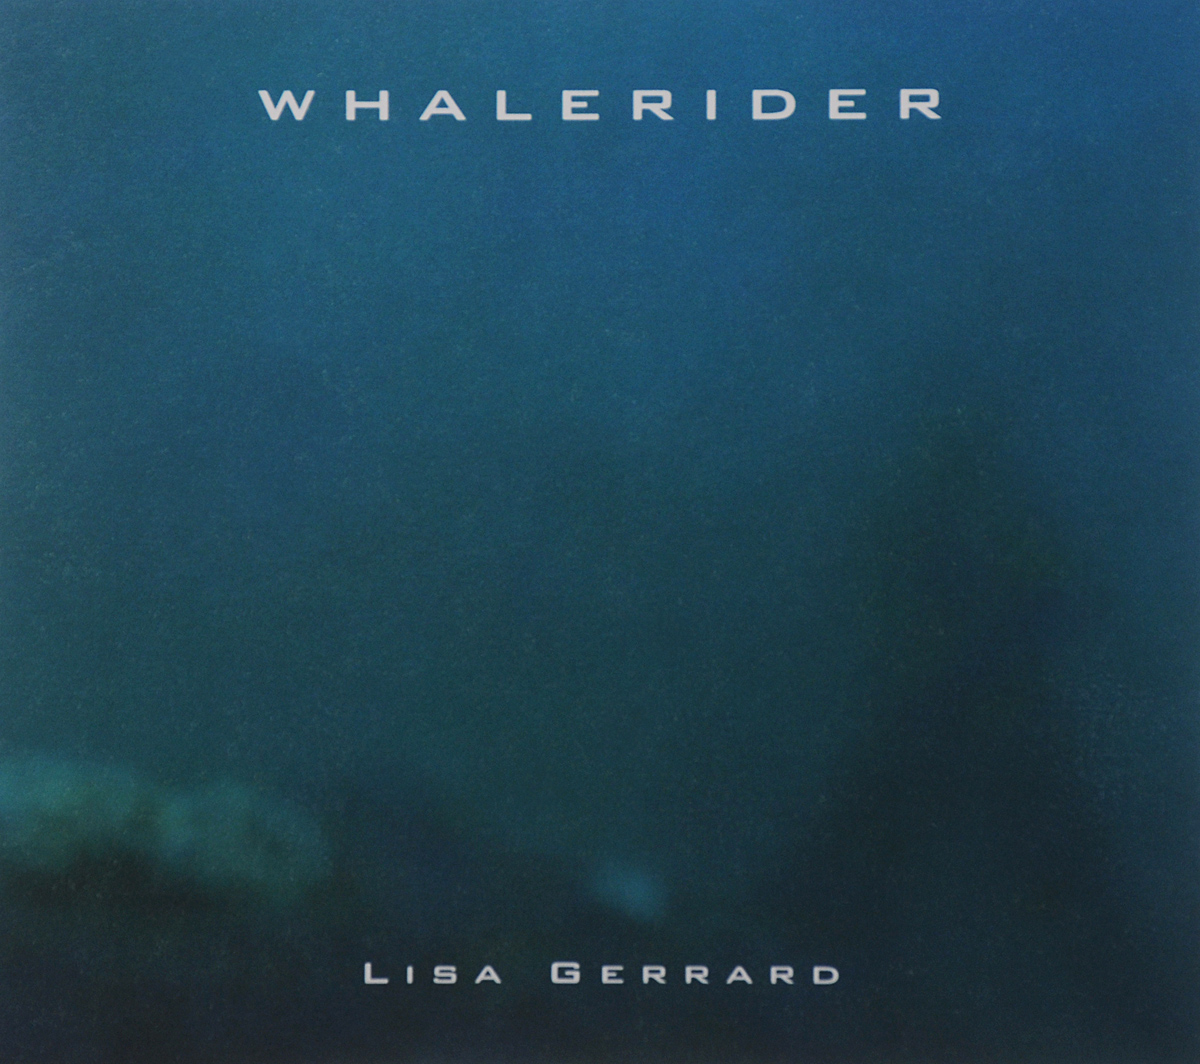 Lisa Gerrard. Whalerider